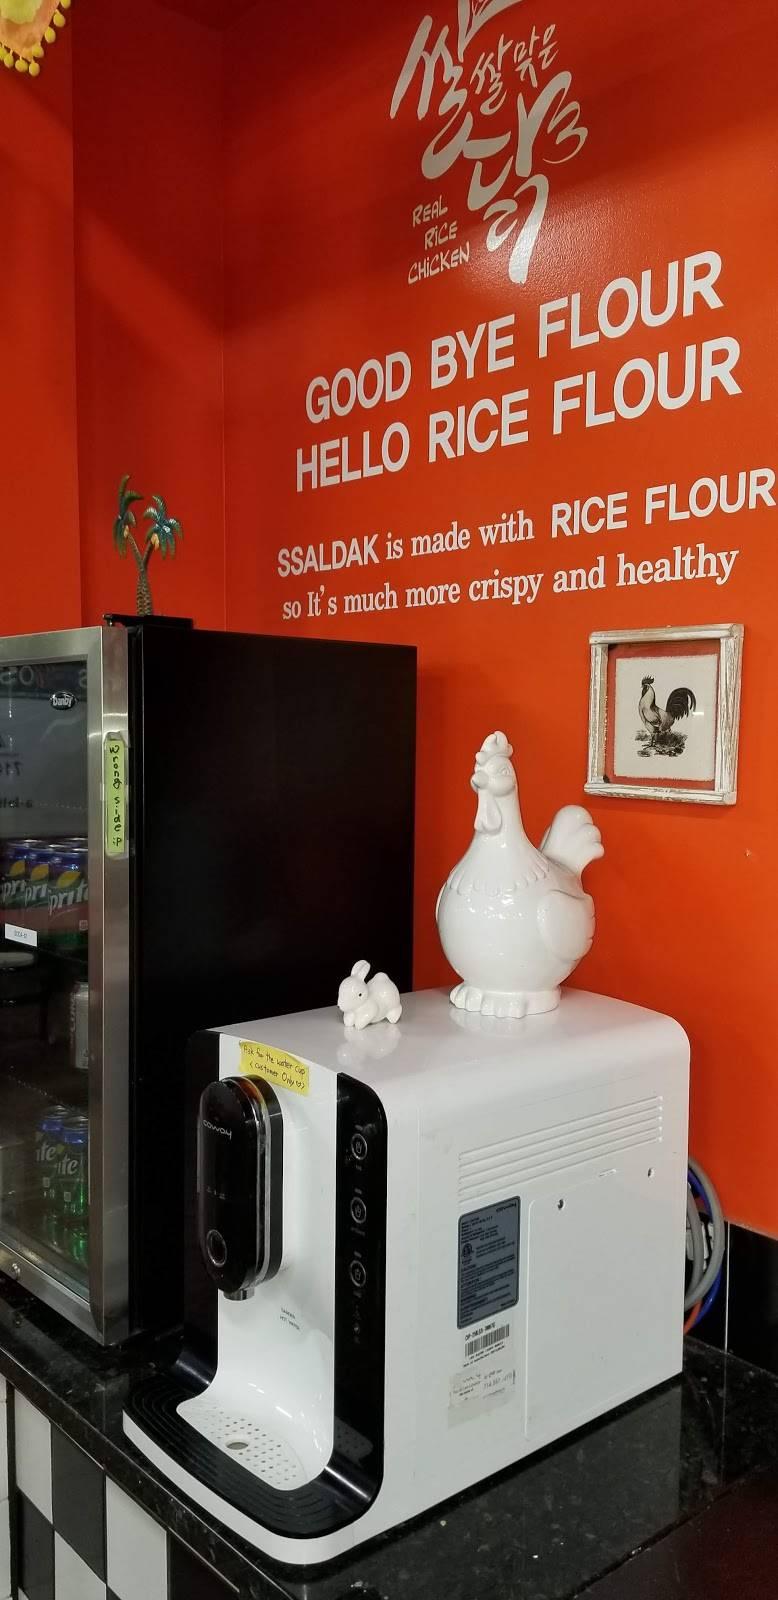 Ssal Chicken   restaurant   1701 W Orangethorpe Ave, Fullerton, CA 92833, USA   7148707701 OR +1 714-870-7701